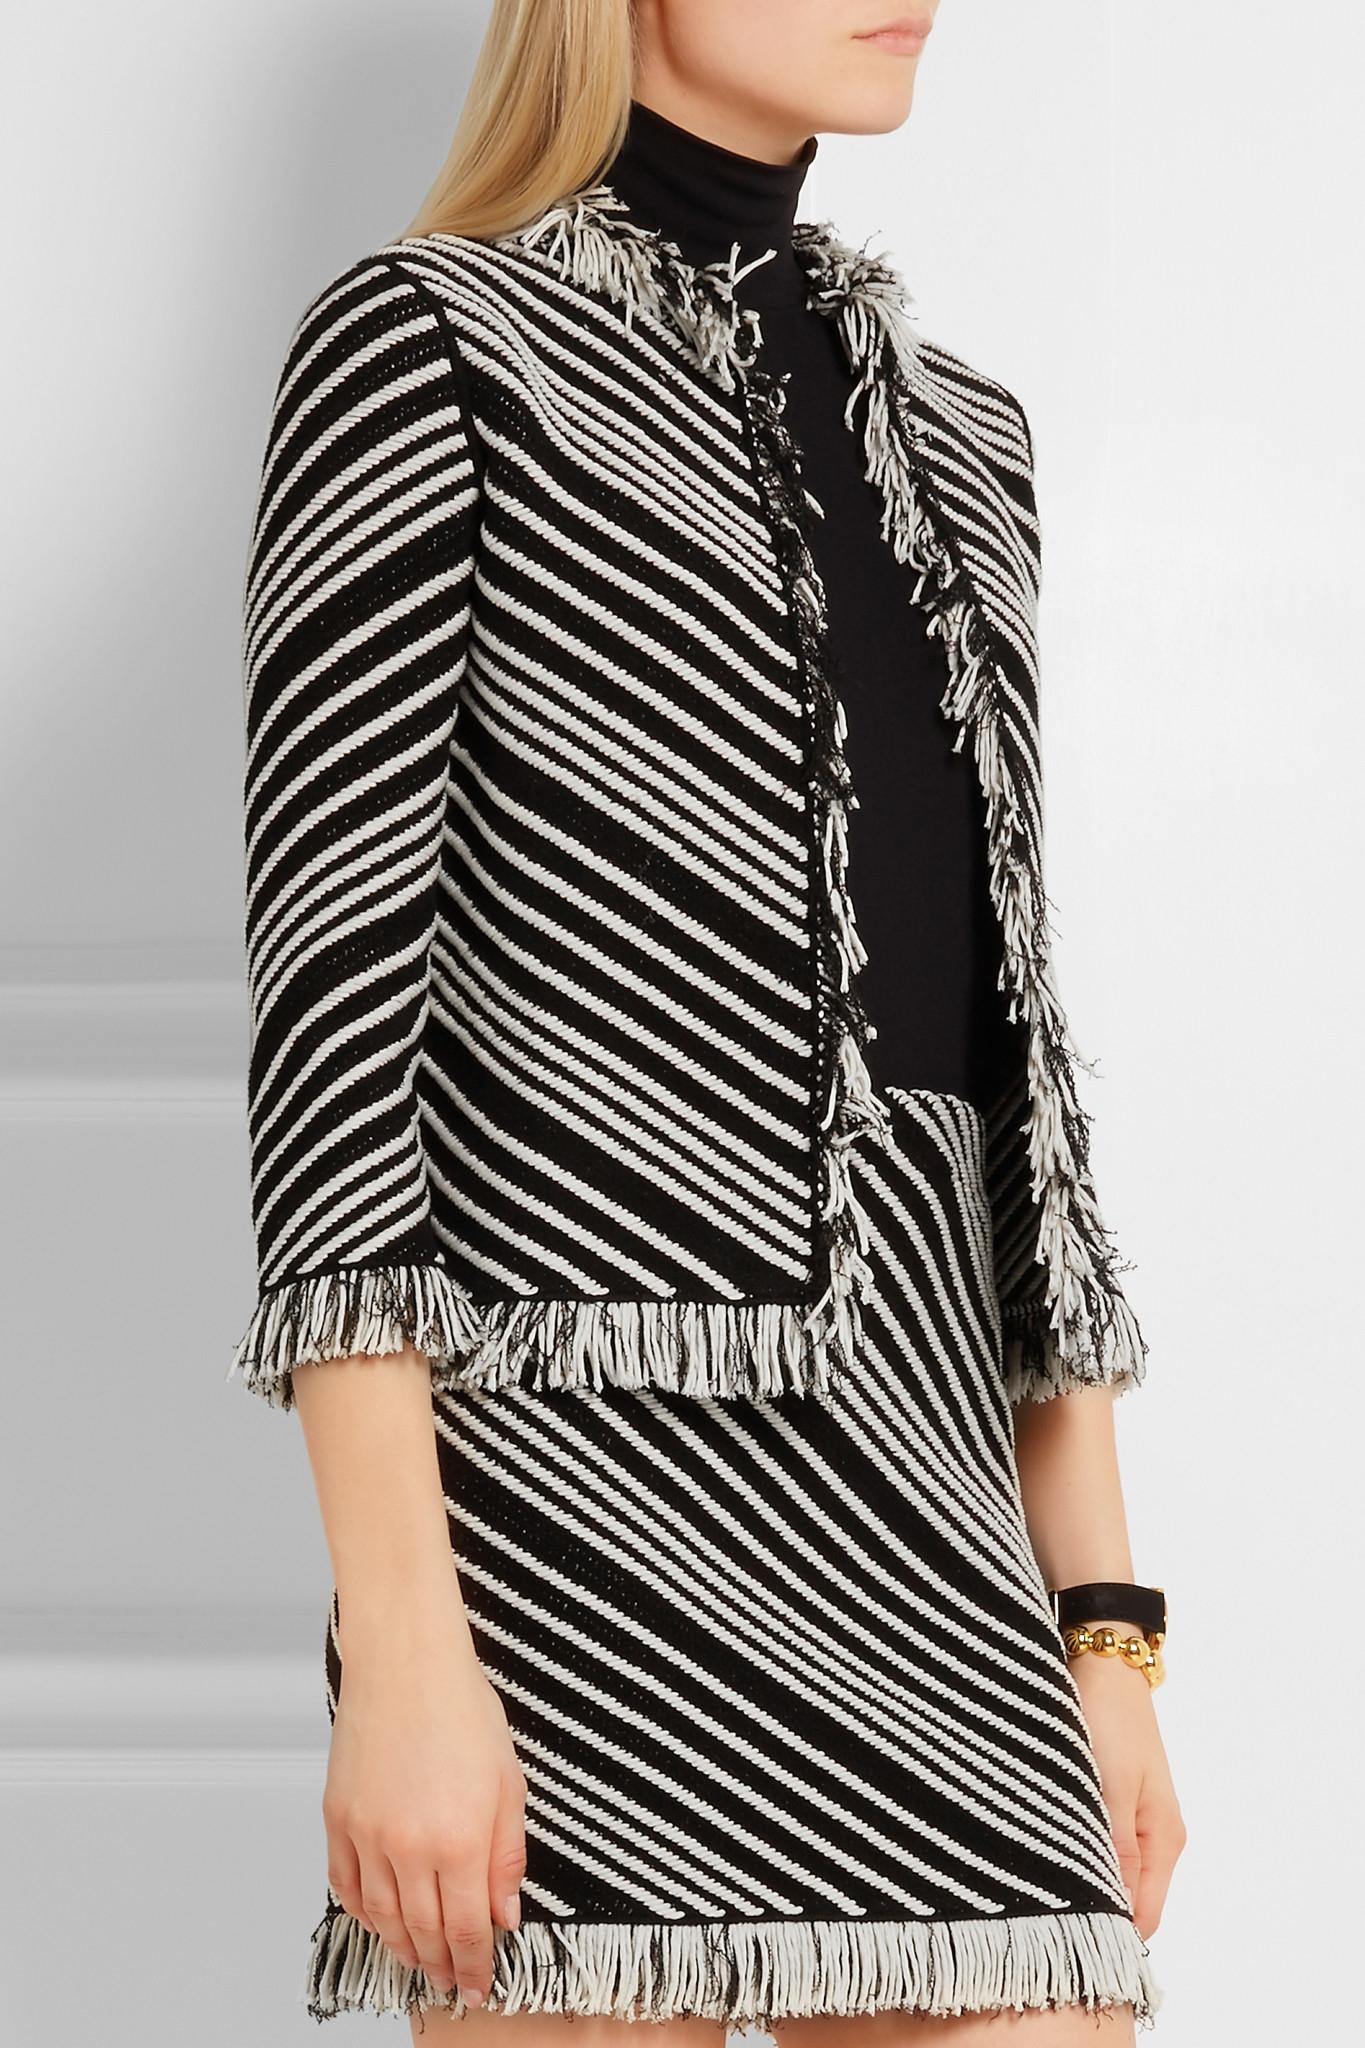 6b6268e8405 Lyst - Sonia Rykiel Fringed Striped Cotton-blend Jacket in Black